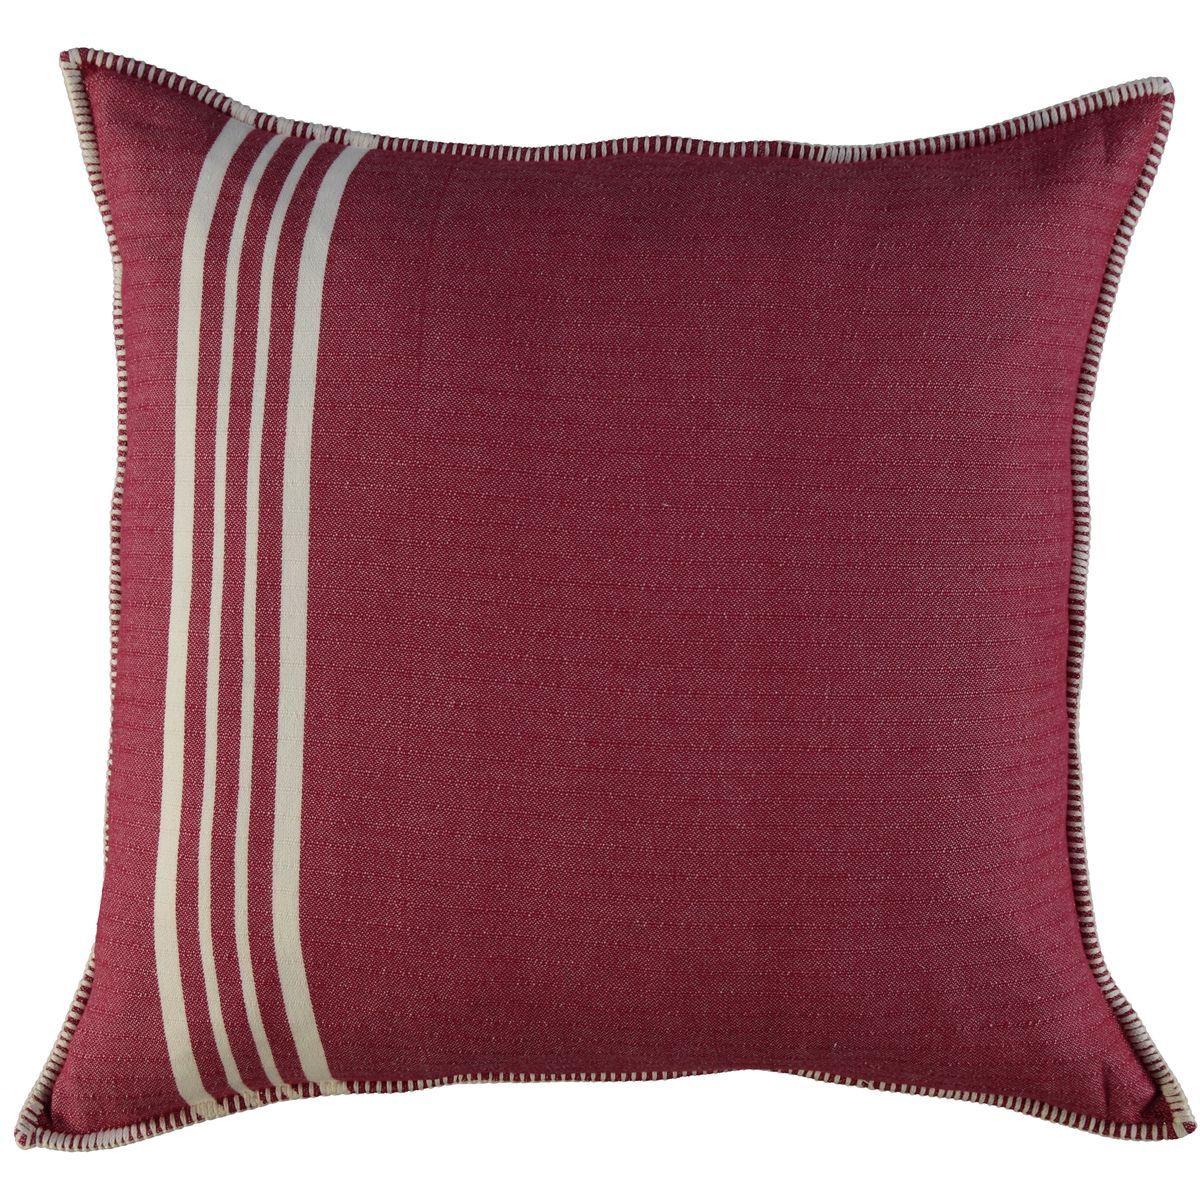 Cushion Cover Sultan - Bordeaux / 65x65